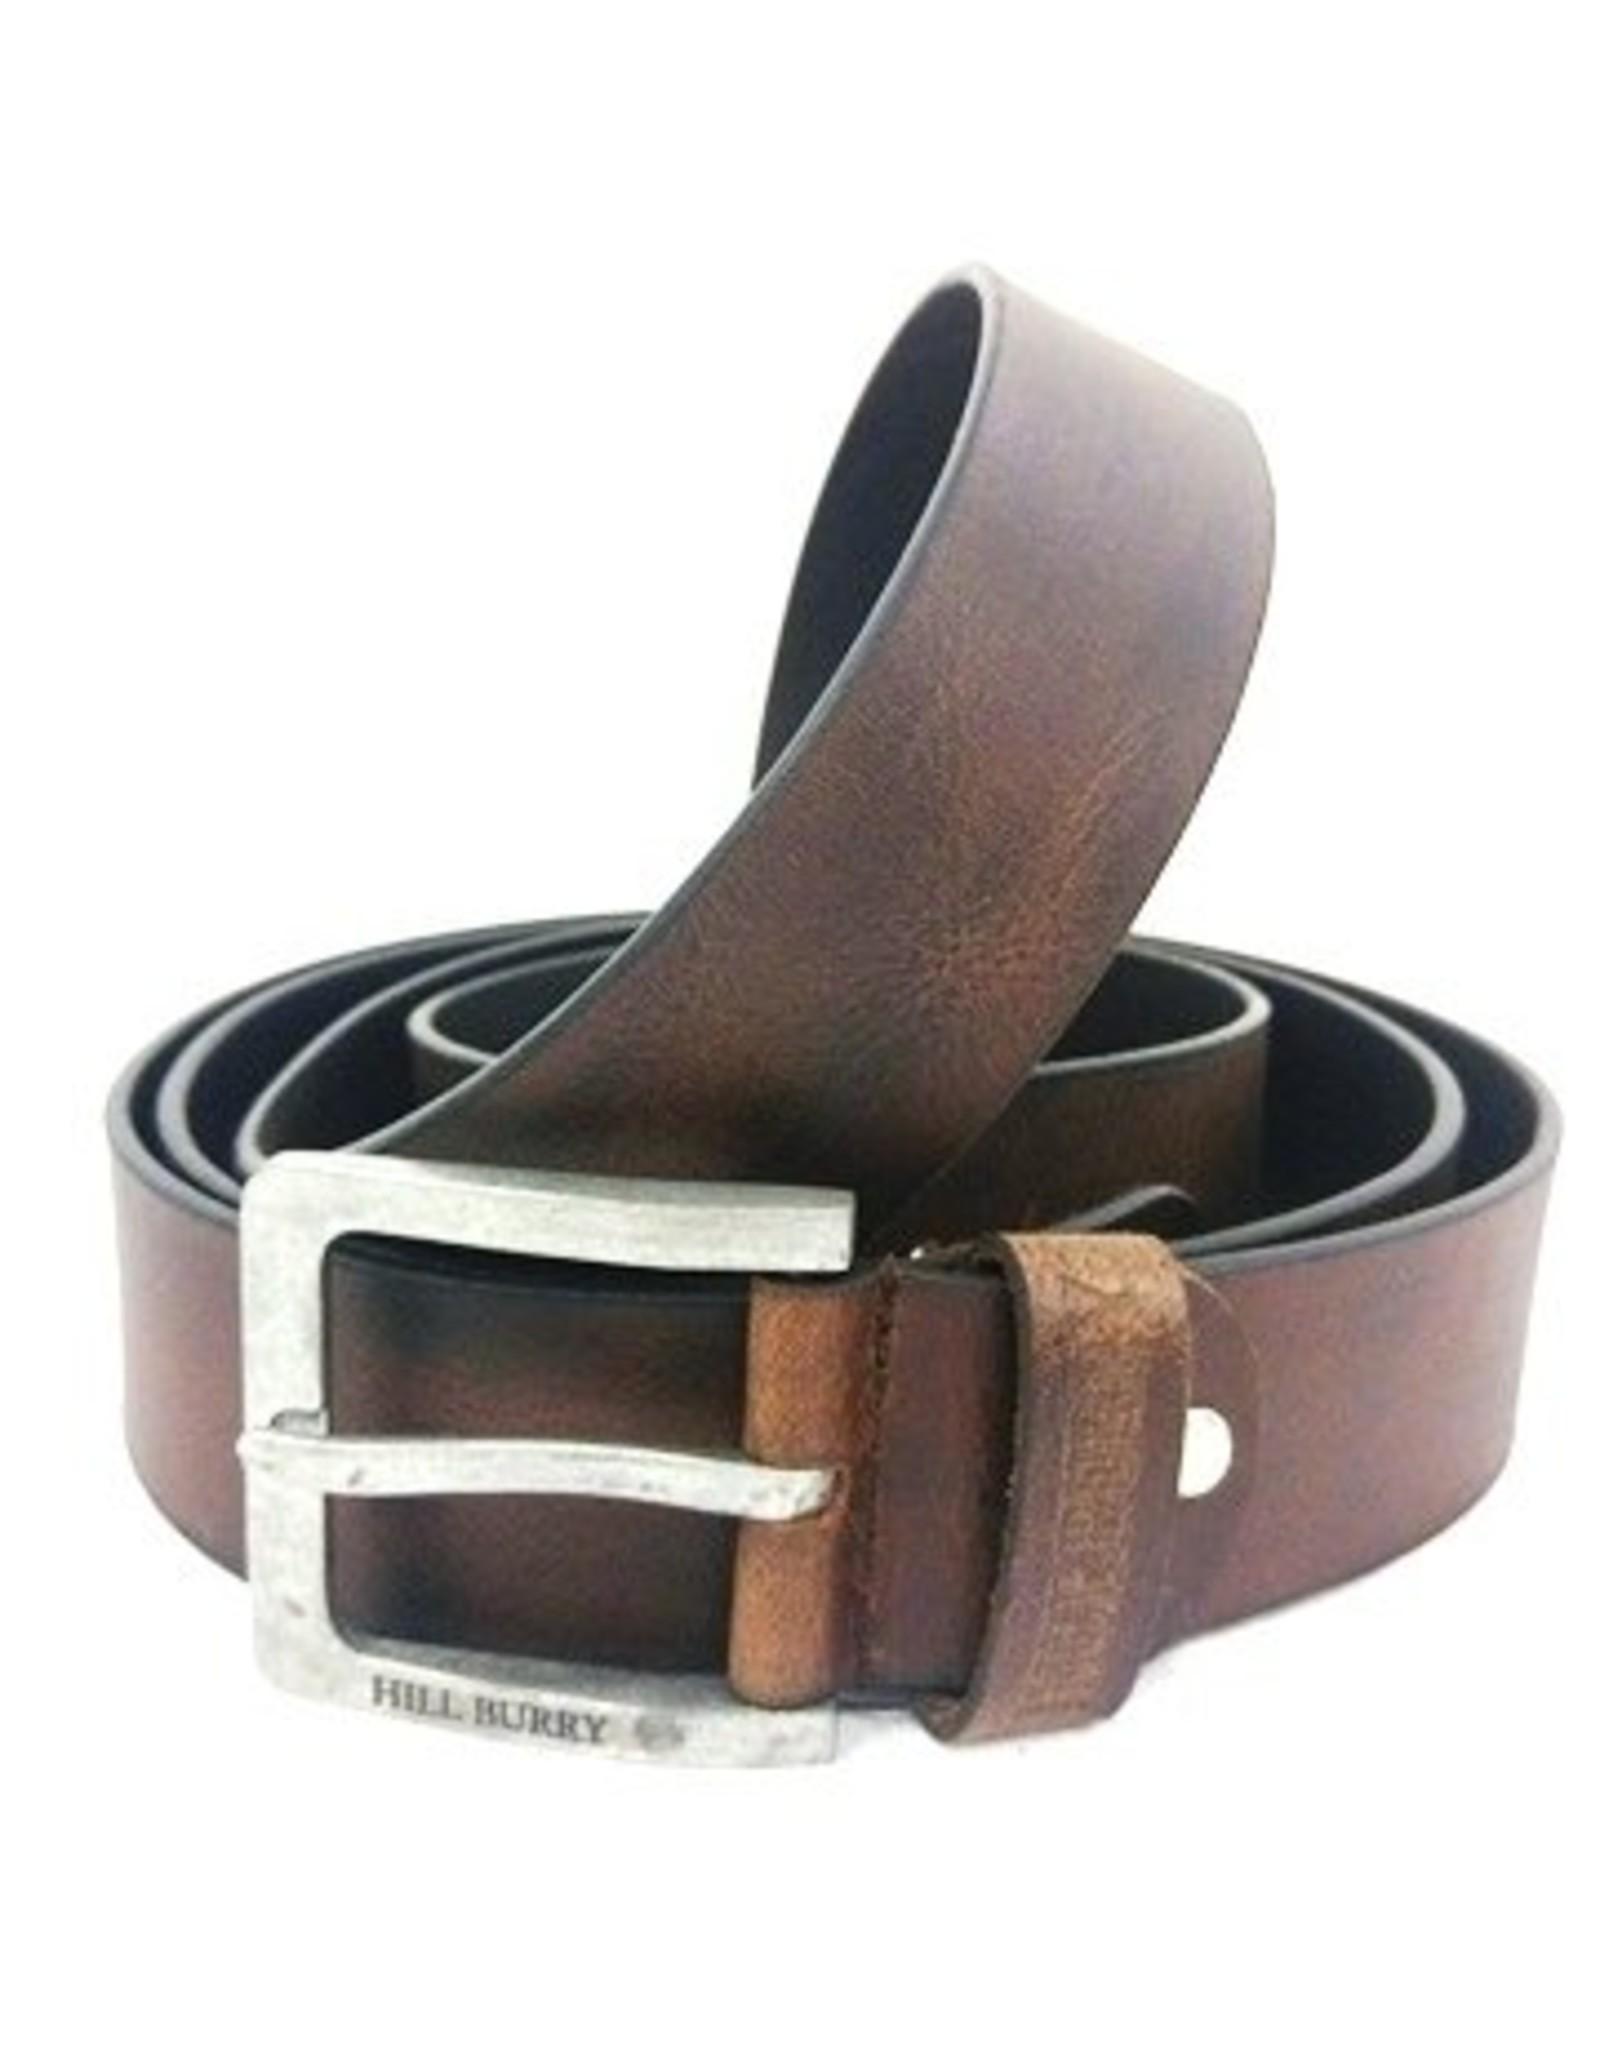 HillBurry Leather belts - HillBurry Leather Belt R03